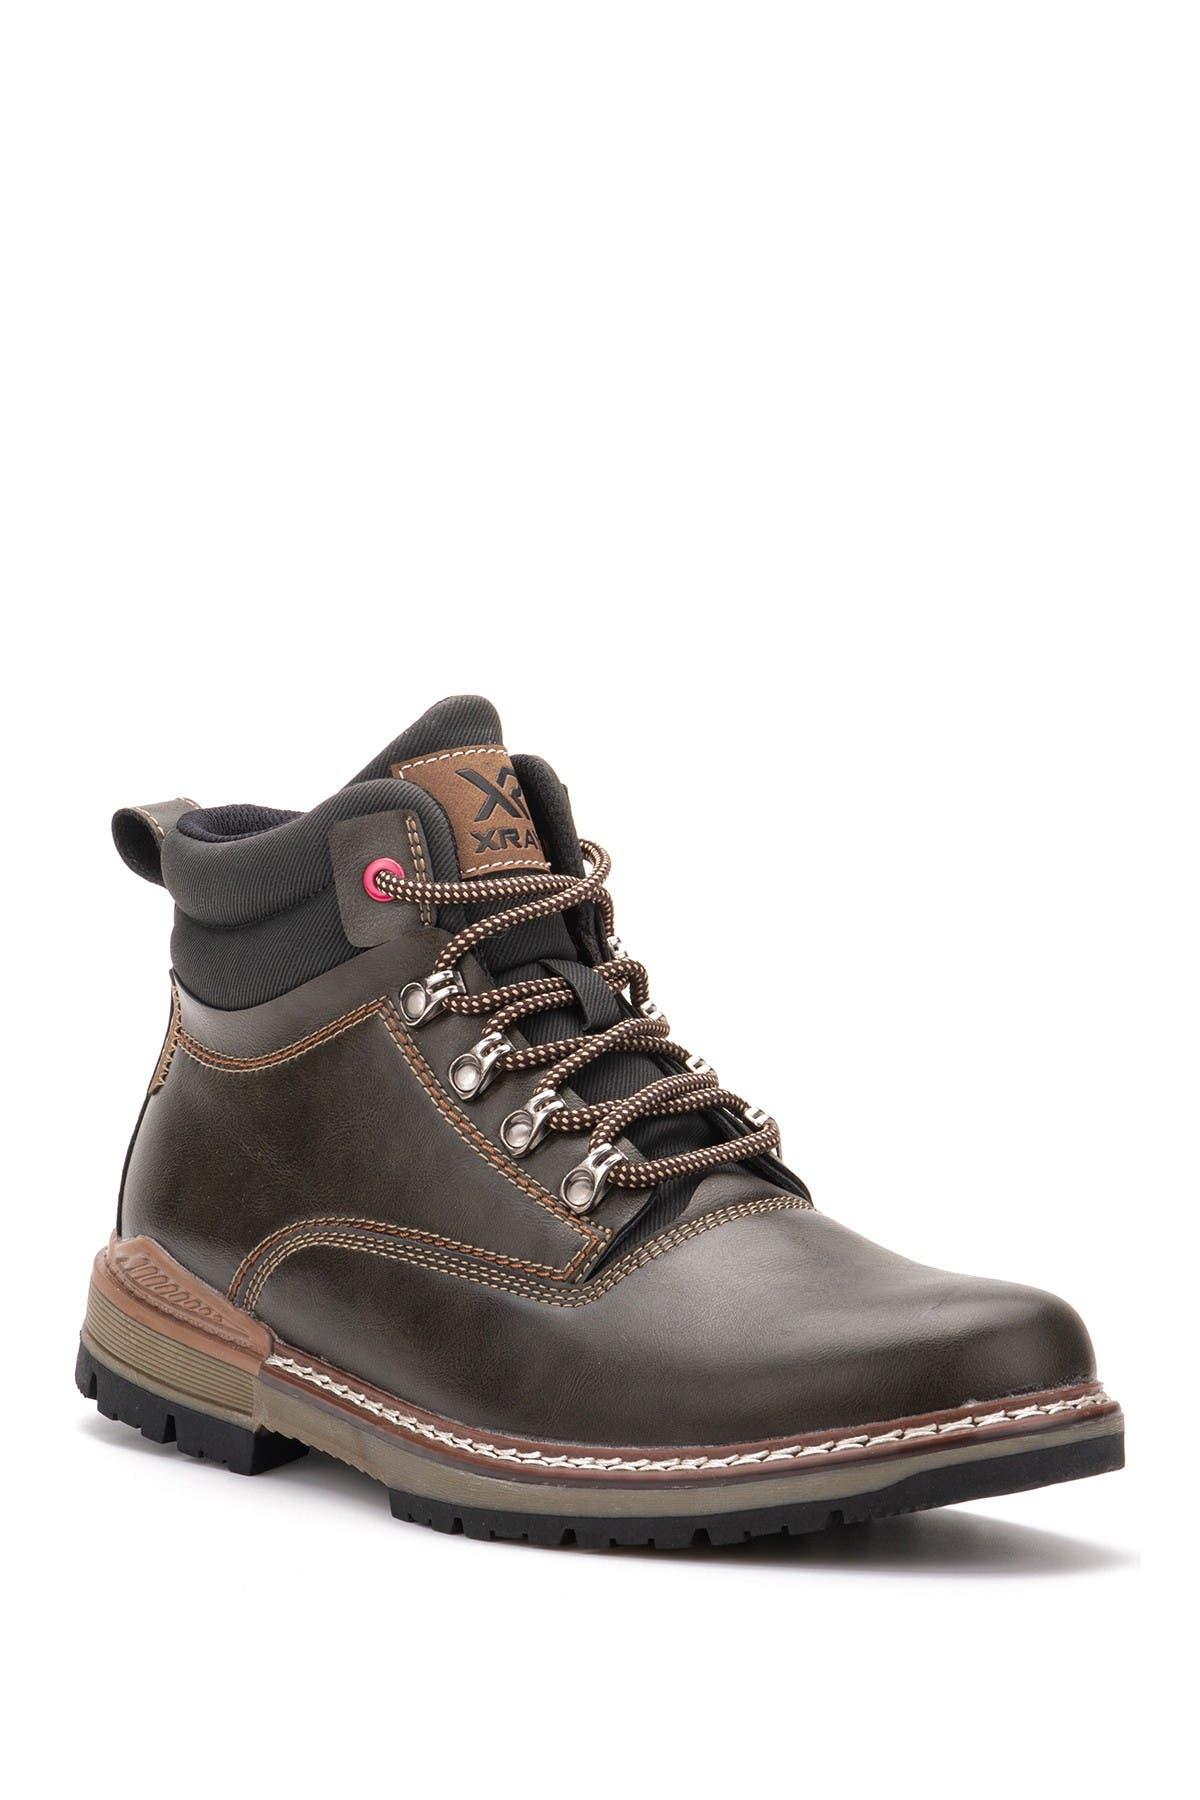 Image of XRAY Arwell Boot